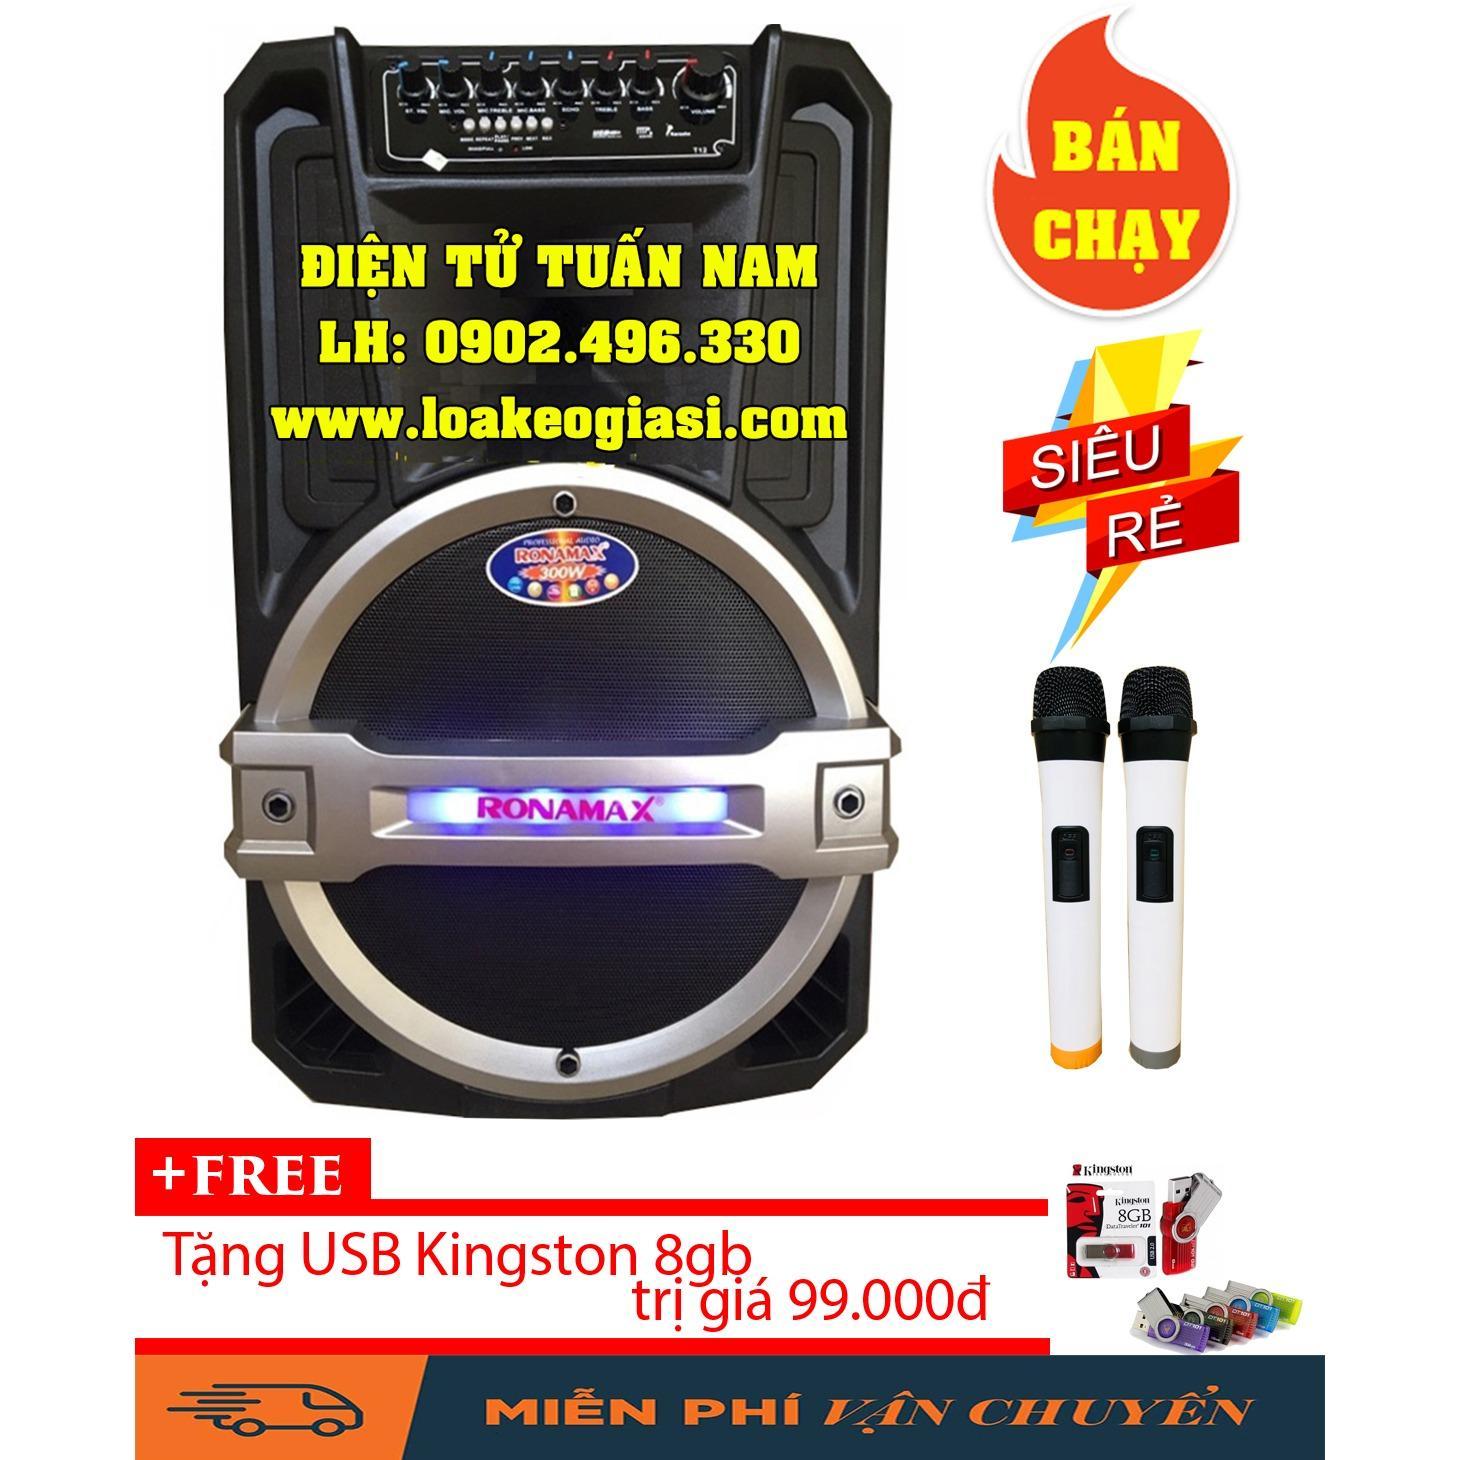 Ôn Tập Loa Keo Bluetooth Ronamax T12 3 Tấc Tặng Usb 8Gb Ronamax Trong Hồ Chí Minh